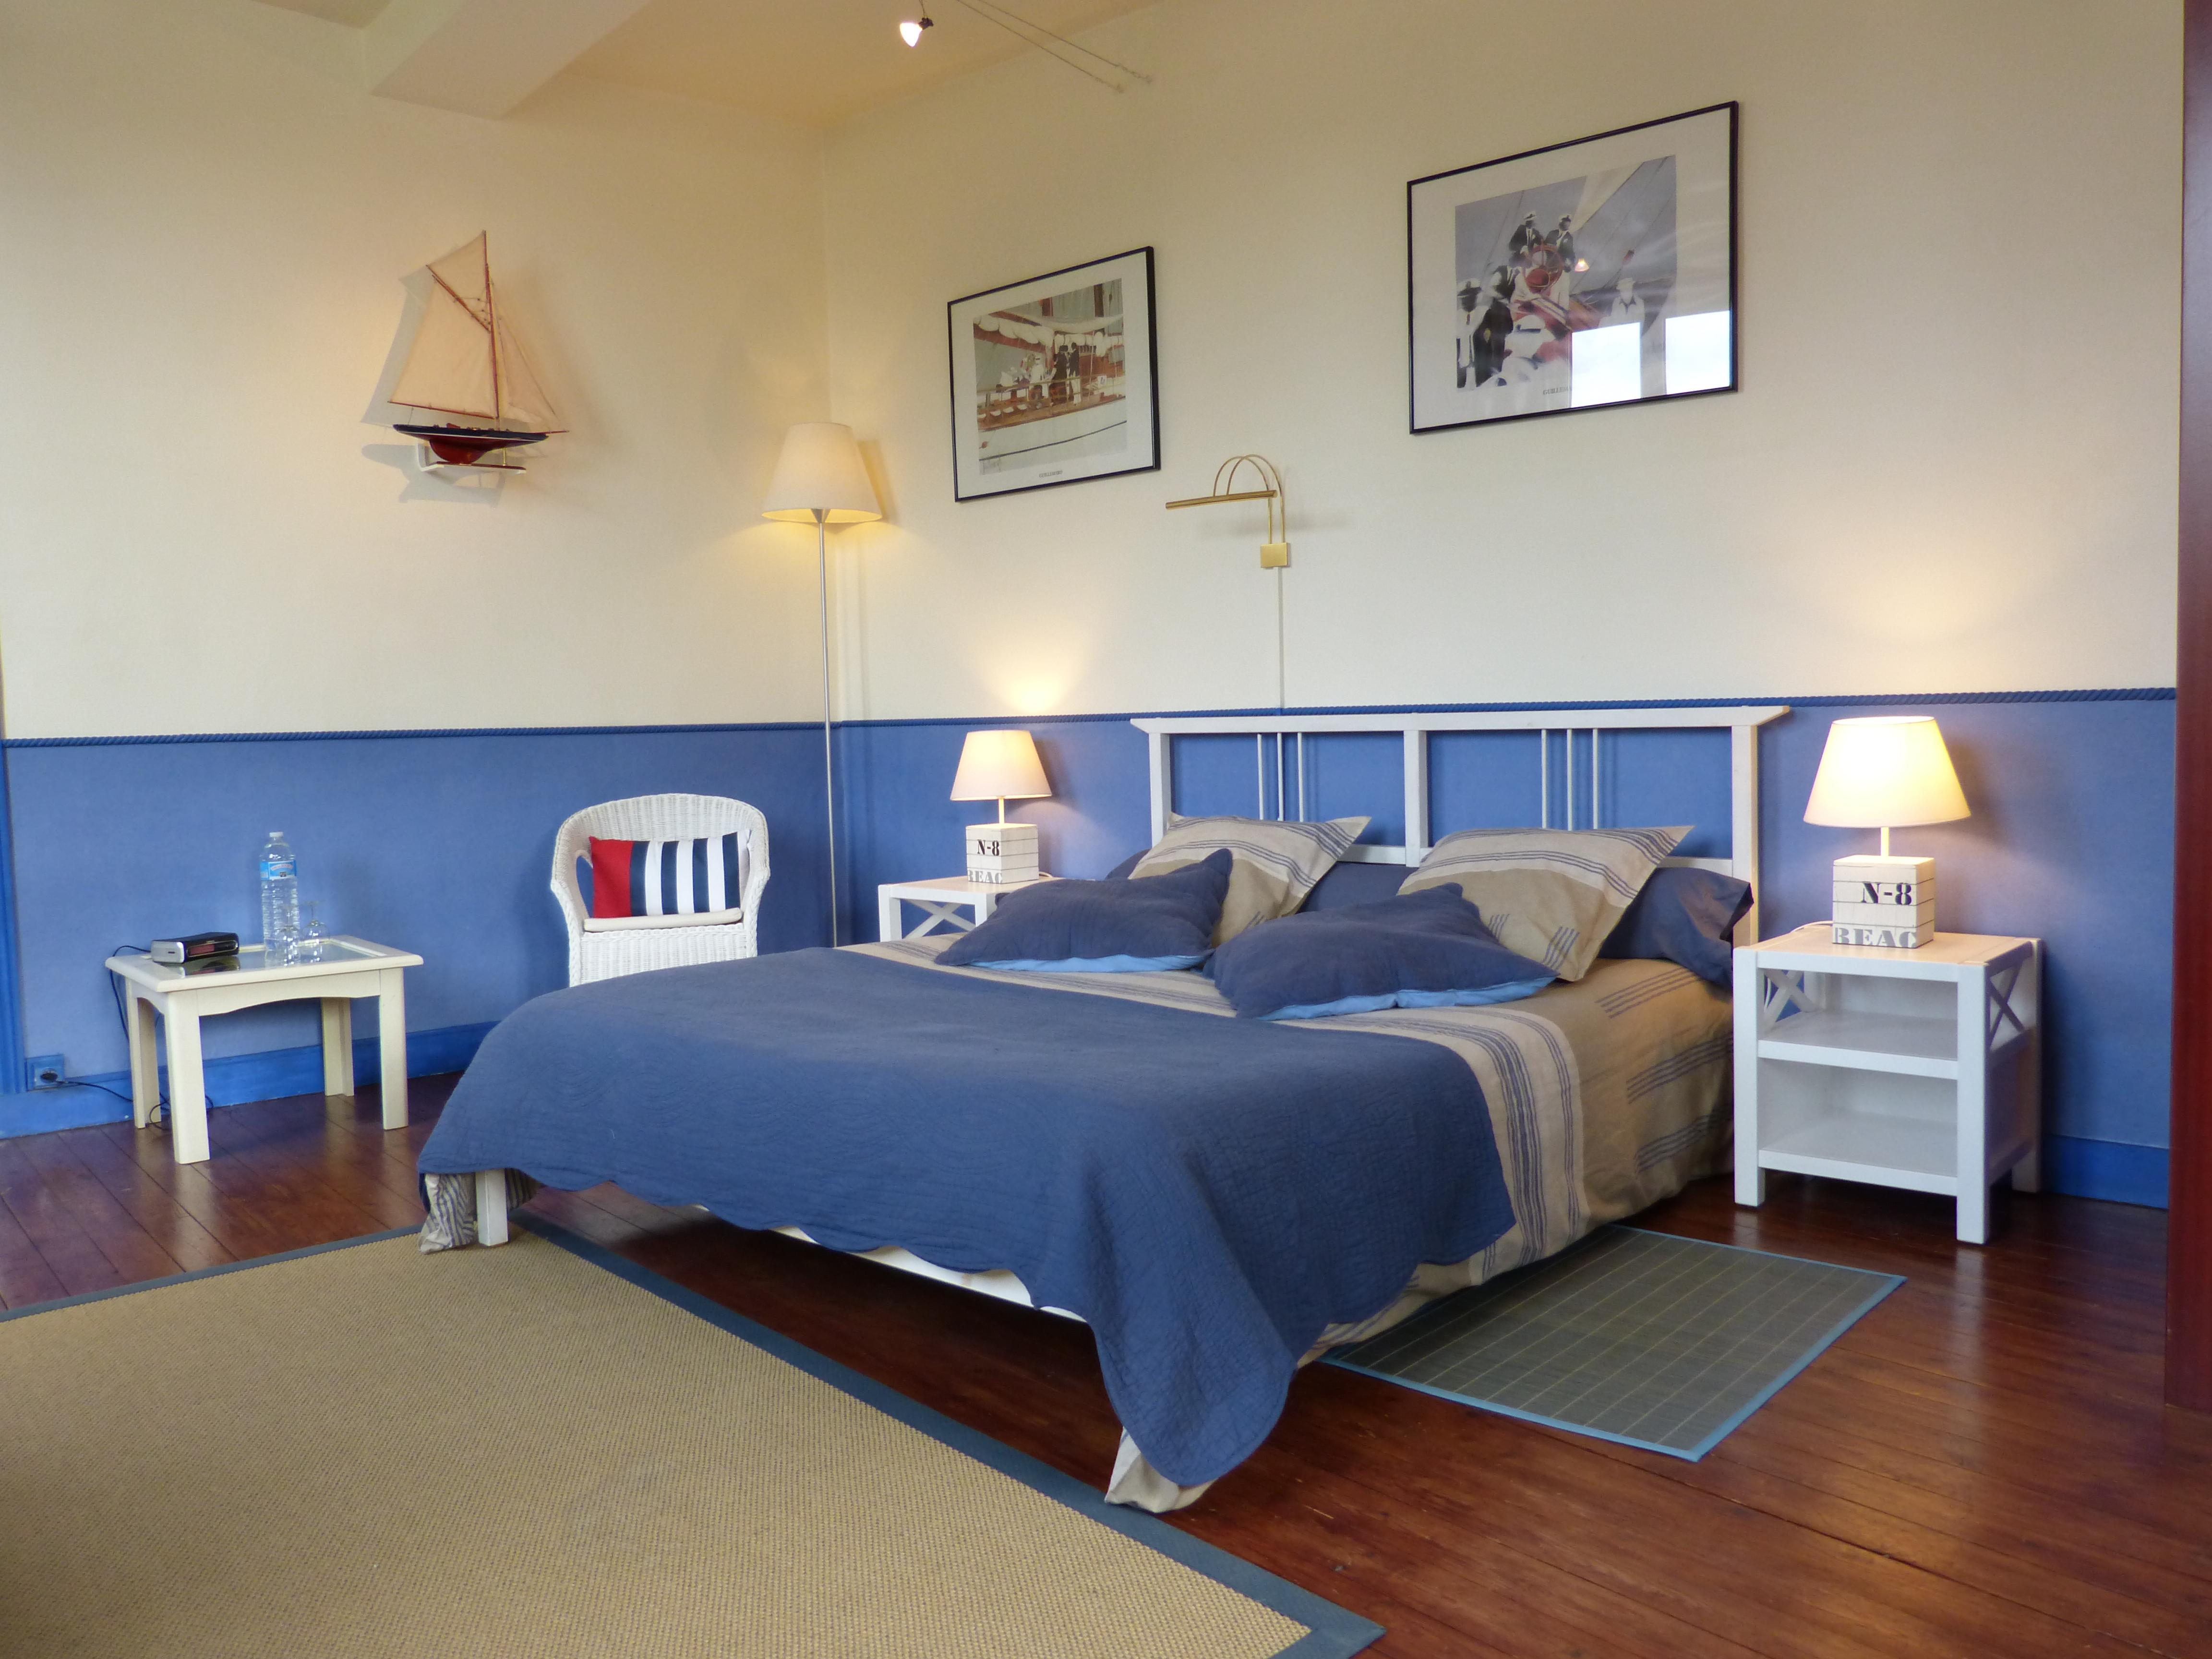 Location vacances dordogne avec piscine privee bergerac - Hotel chambre avec piscine privee ...